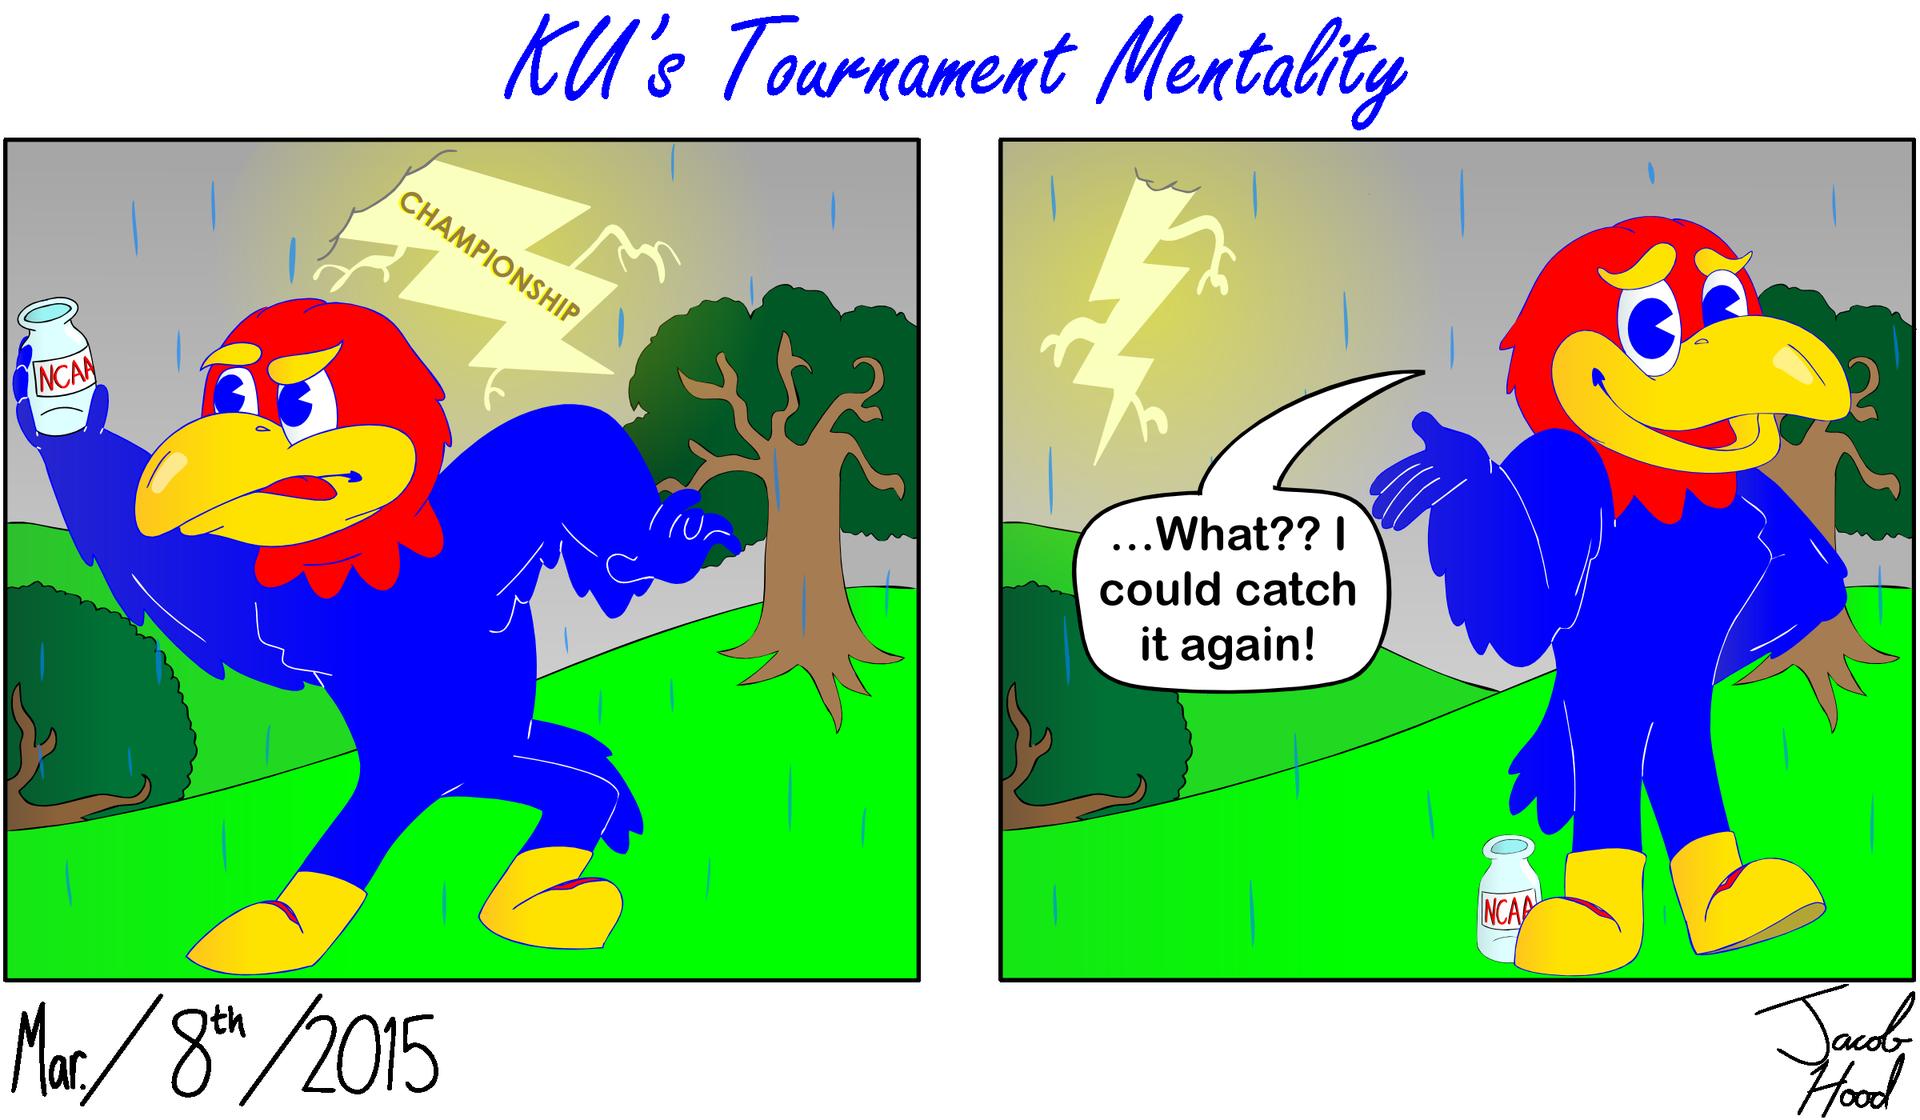 KU's Tournament Mentality